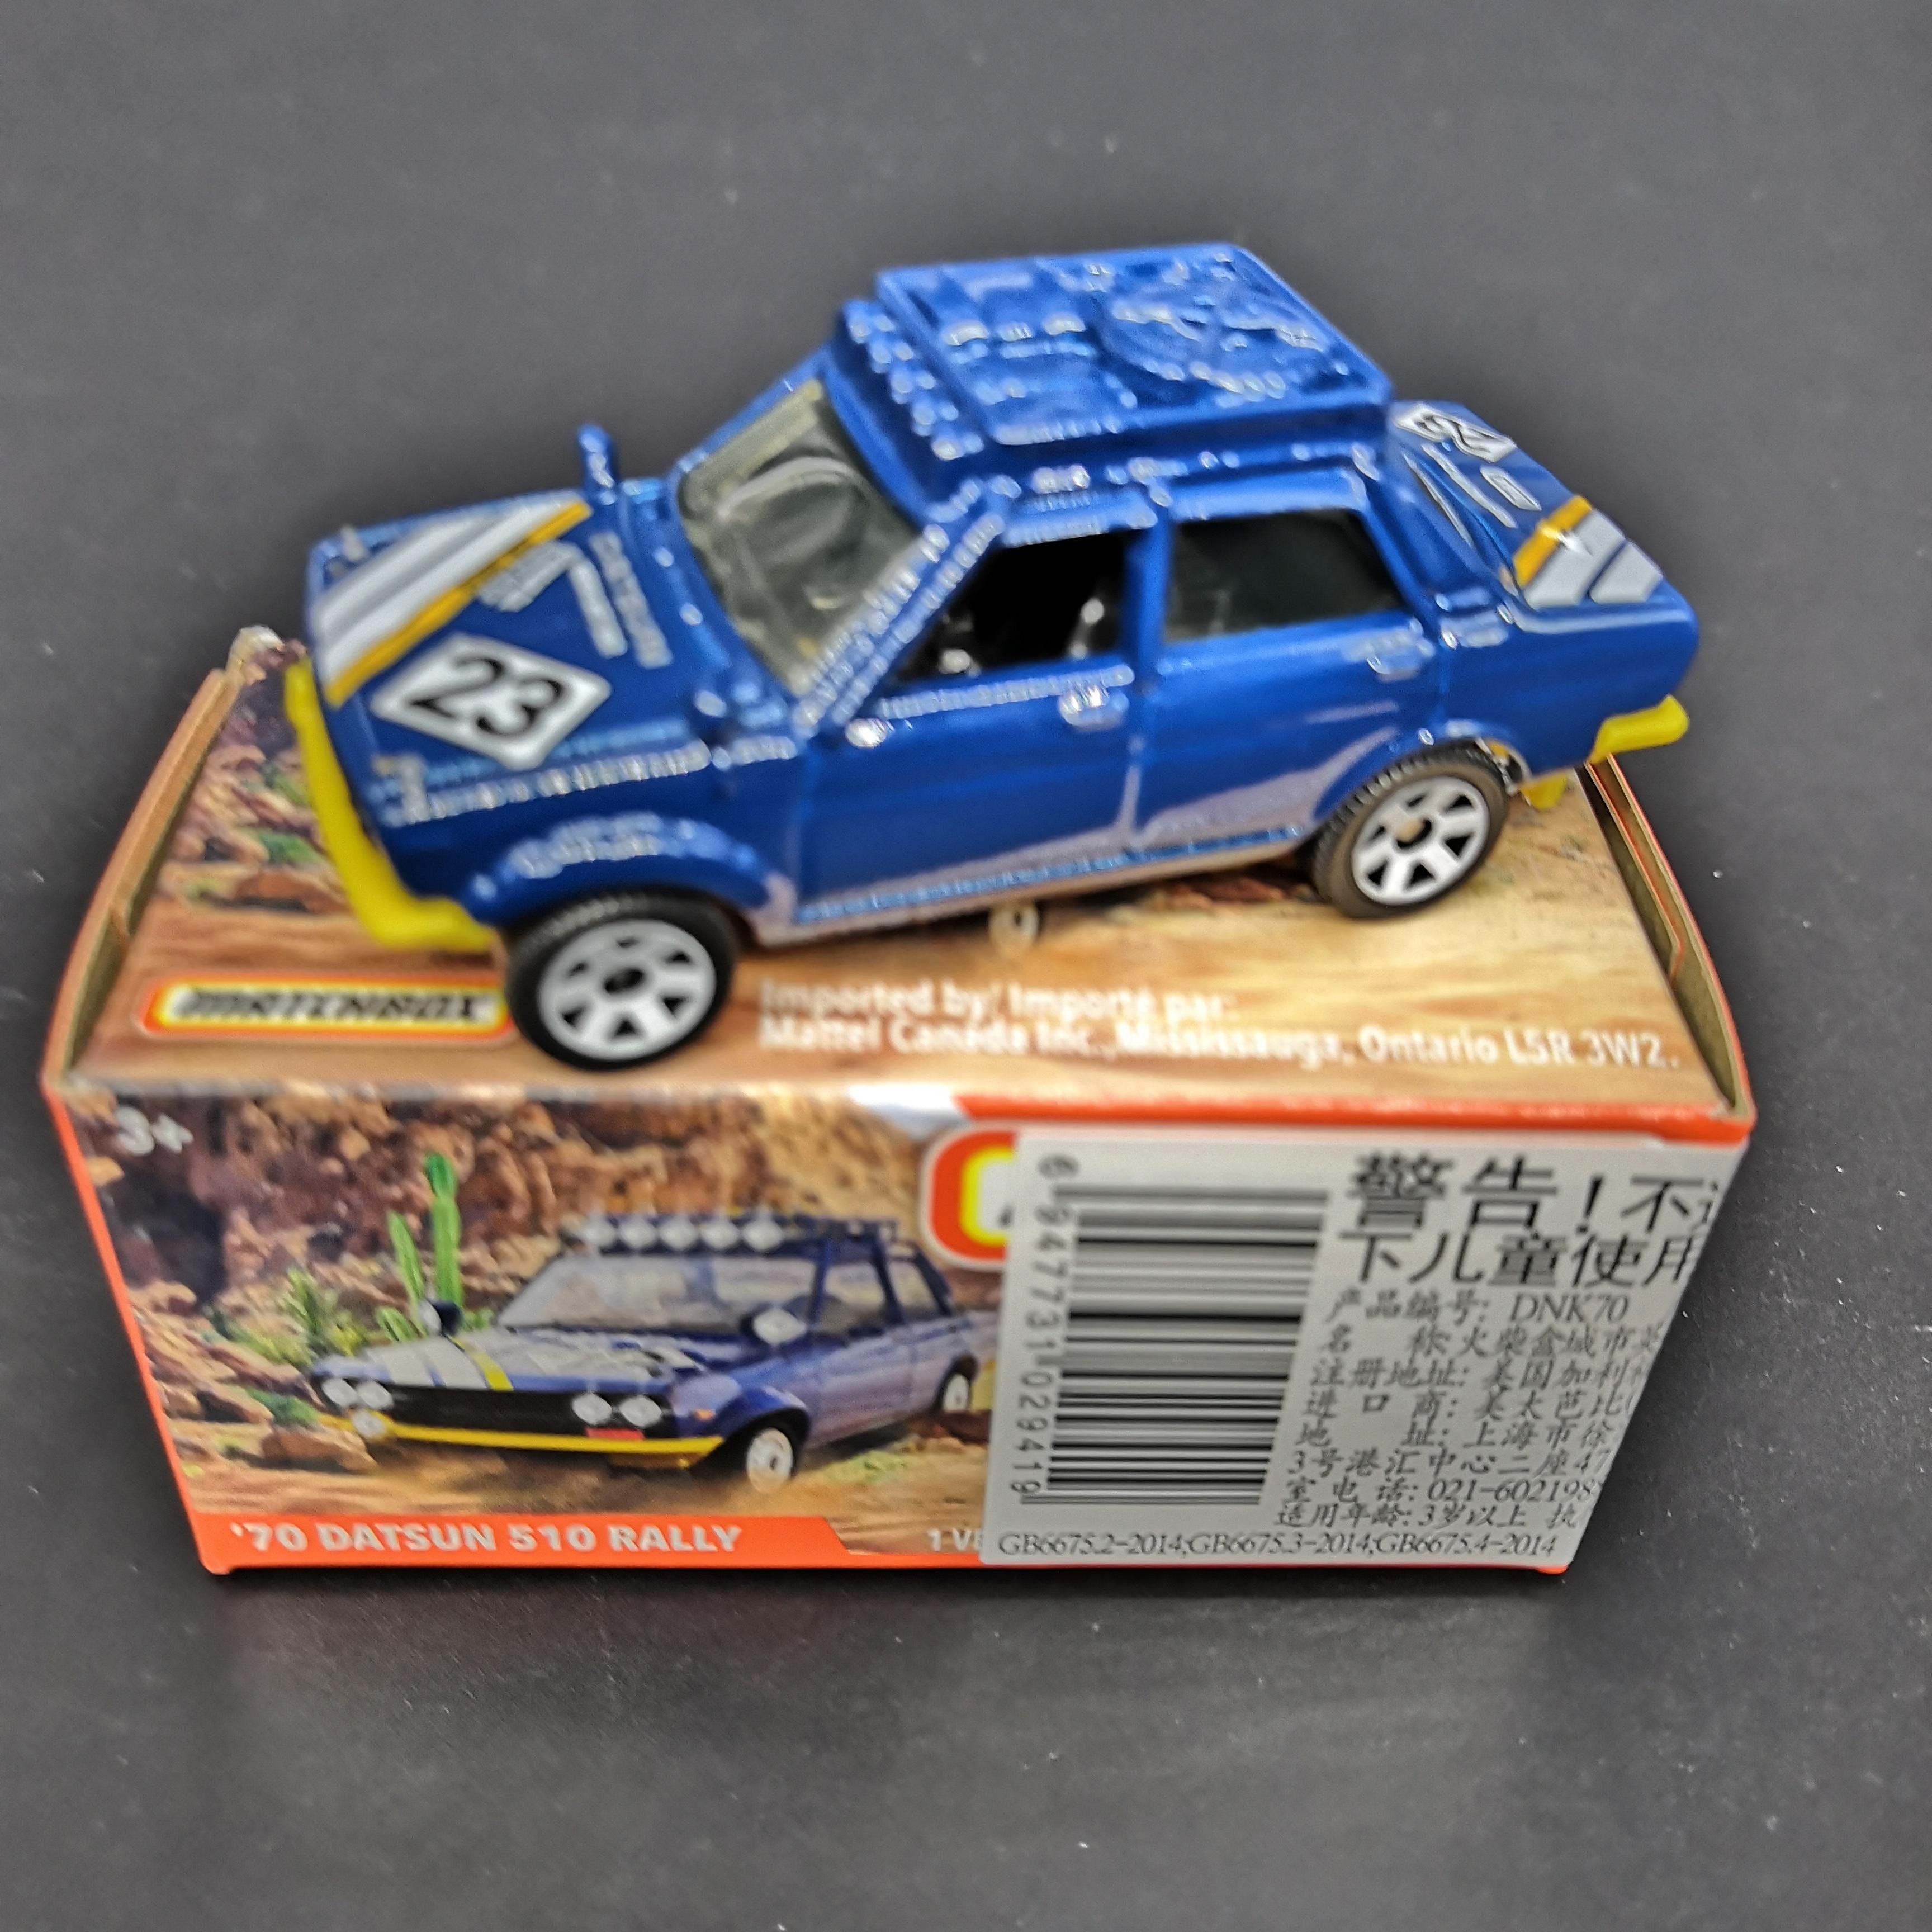 2019 Matchbox Car 1:64 Sports Car 70 DATSUN 510 RALLY  Metal Material Body Race Car Collection Alloy Car Gift